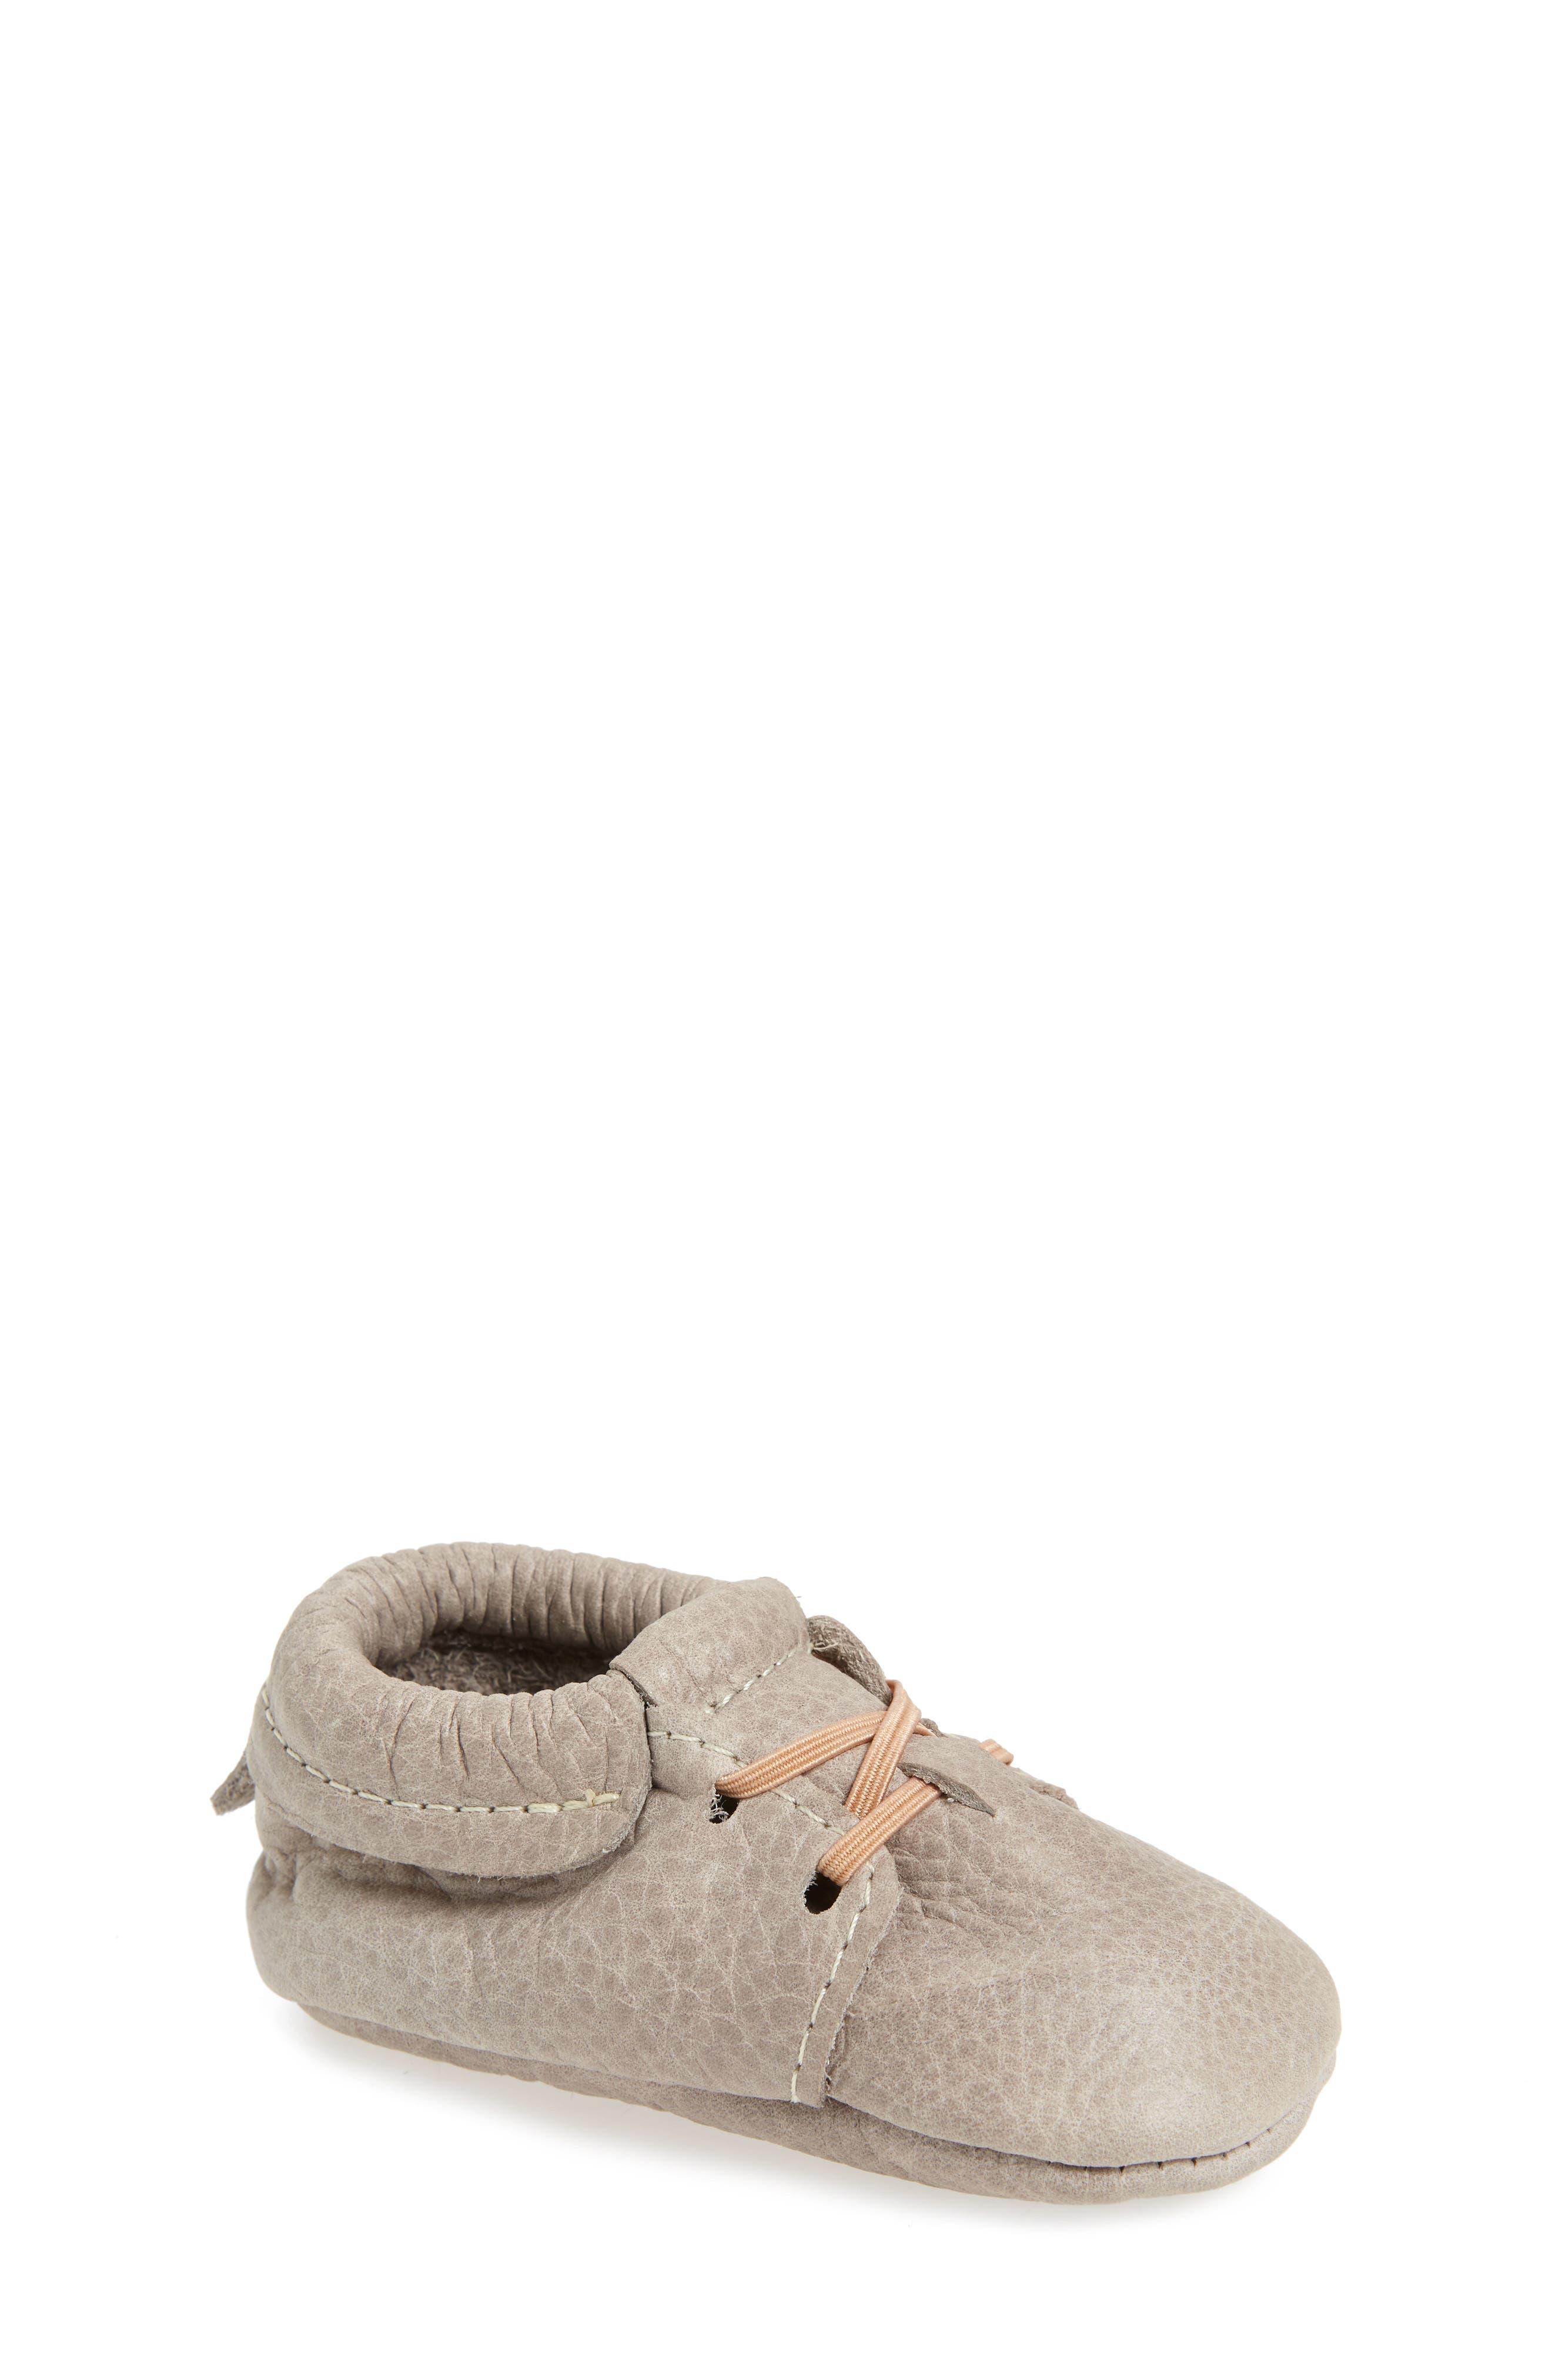 Oxford Crib Shoe,                             Main thumbnail 1, color,                             GRAY